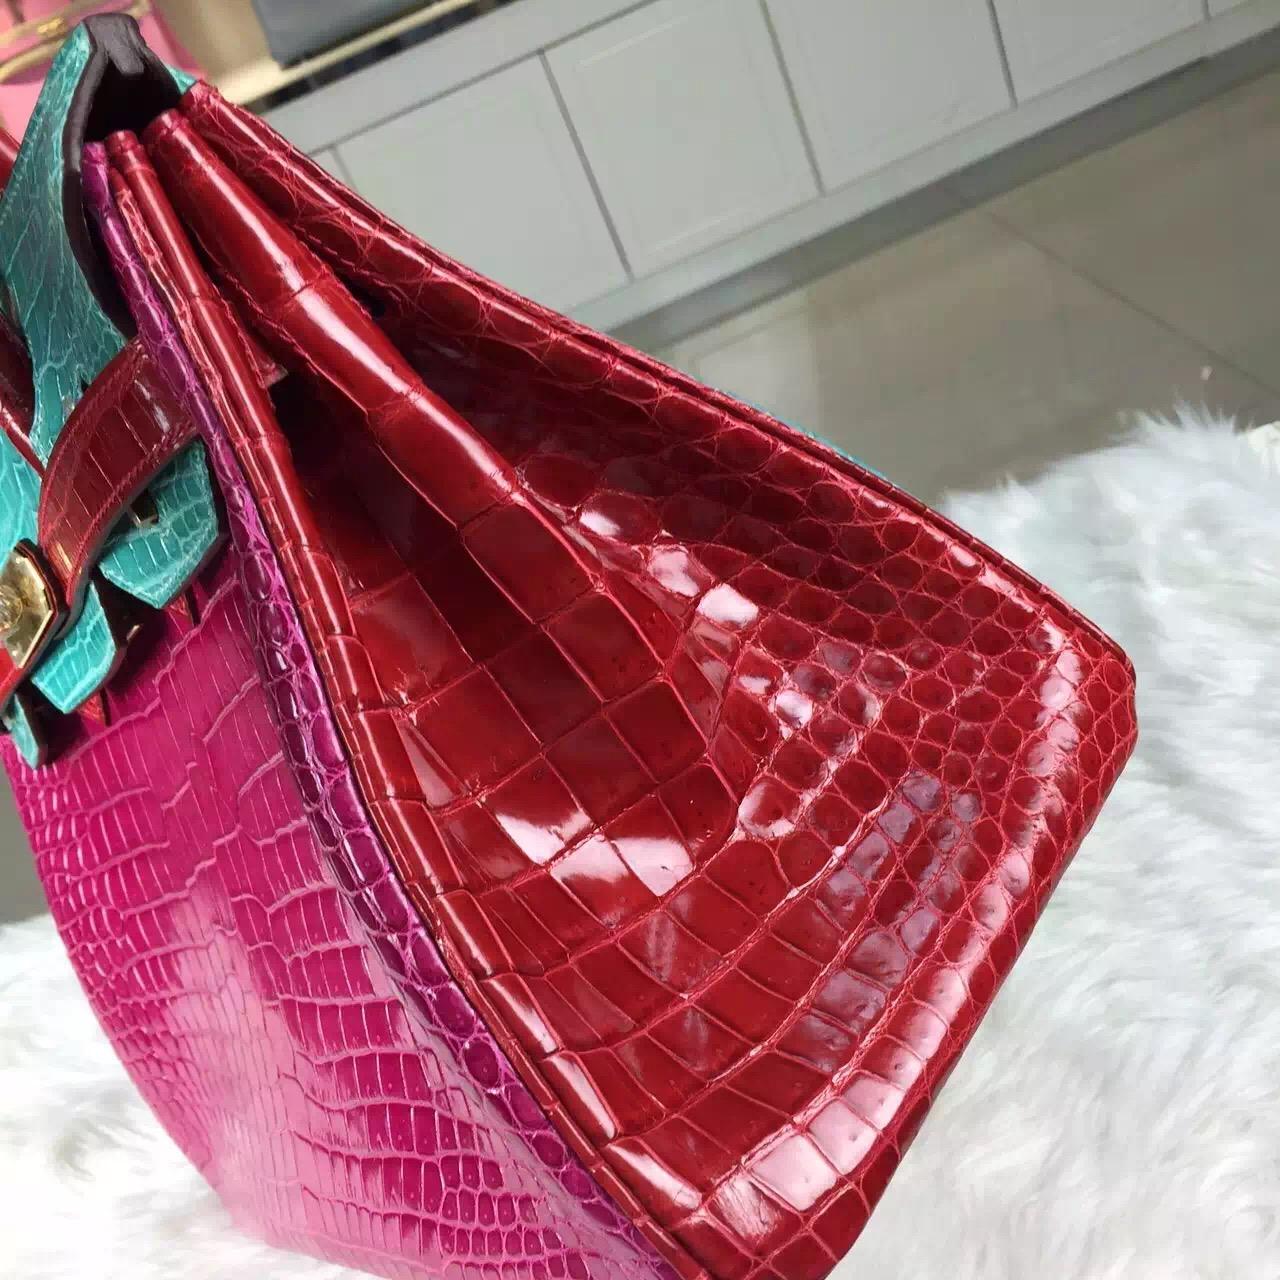 2015 New Hermes Birkin Bag30CM Color-blocking Crocodile Shiny Leather J5/6W/Q5